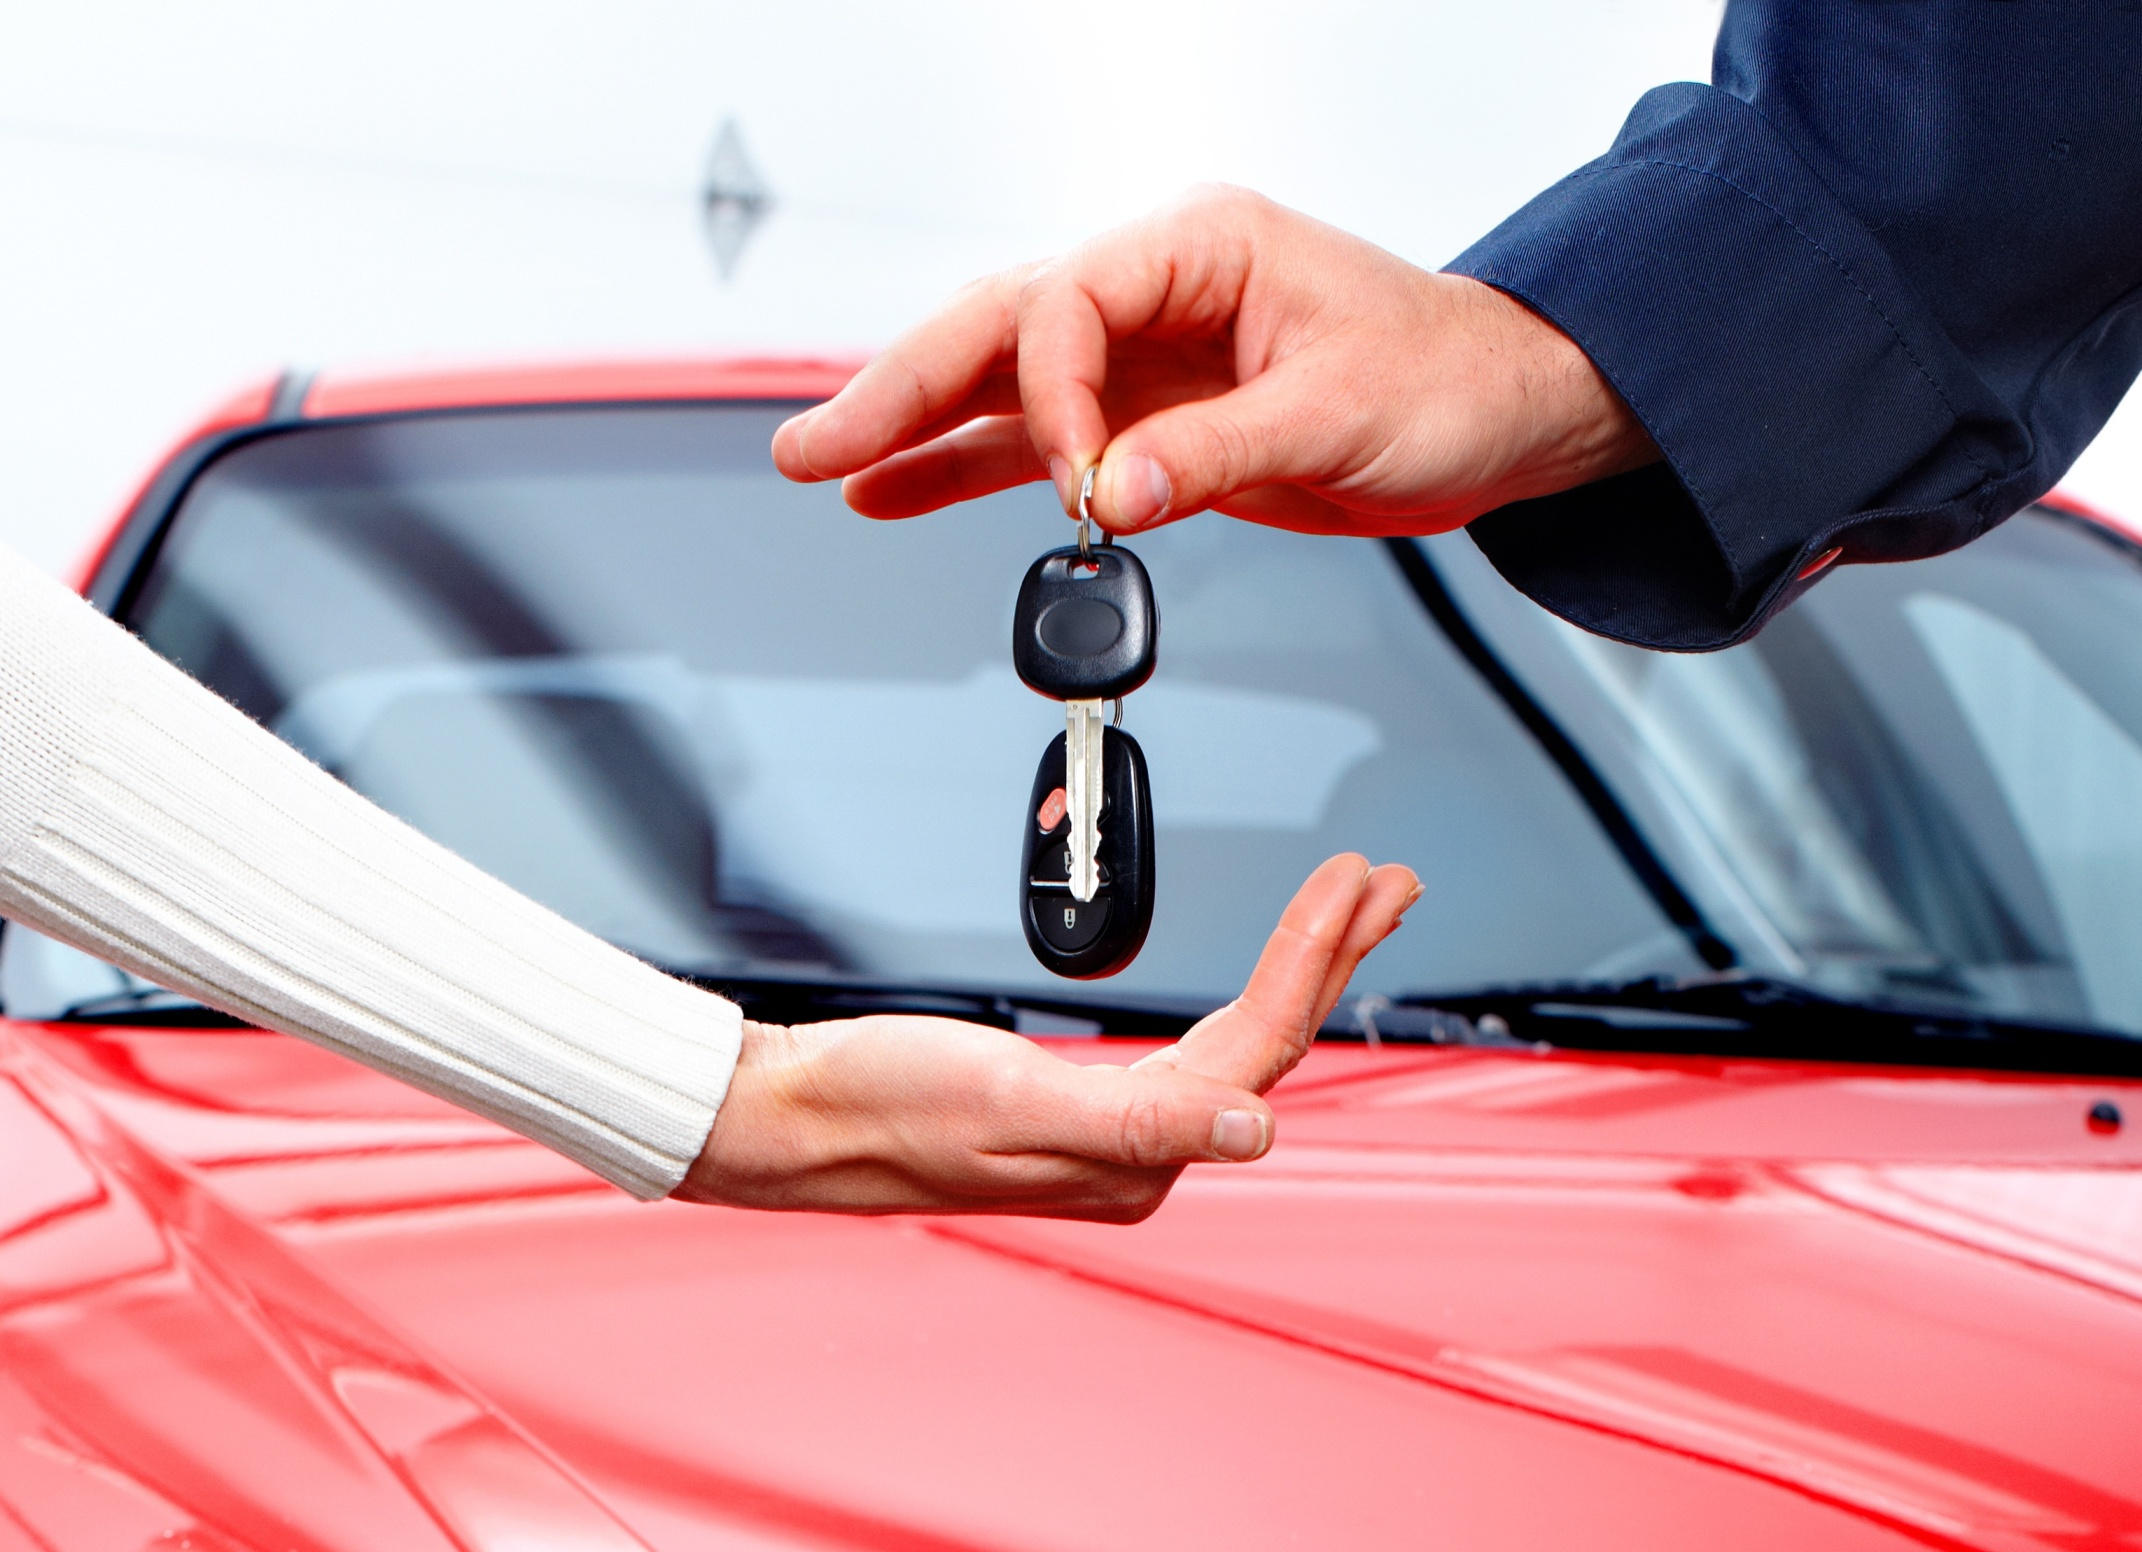 Картинка продажи автомобиля